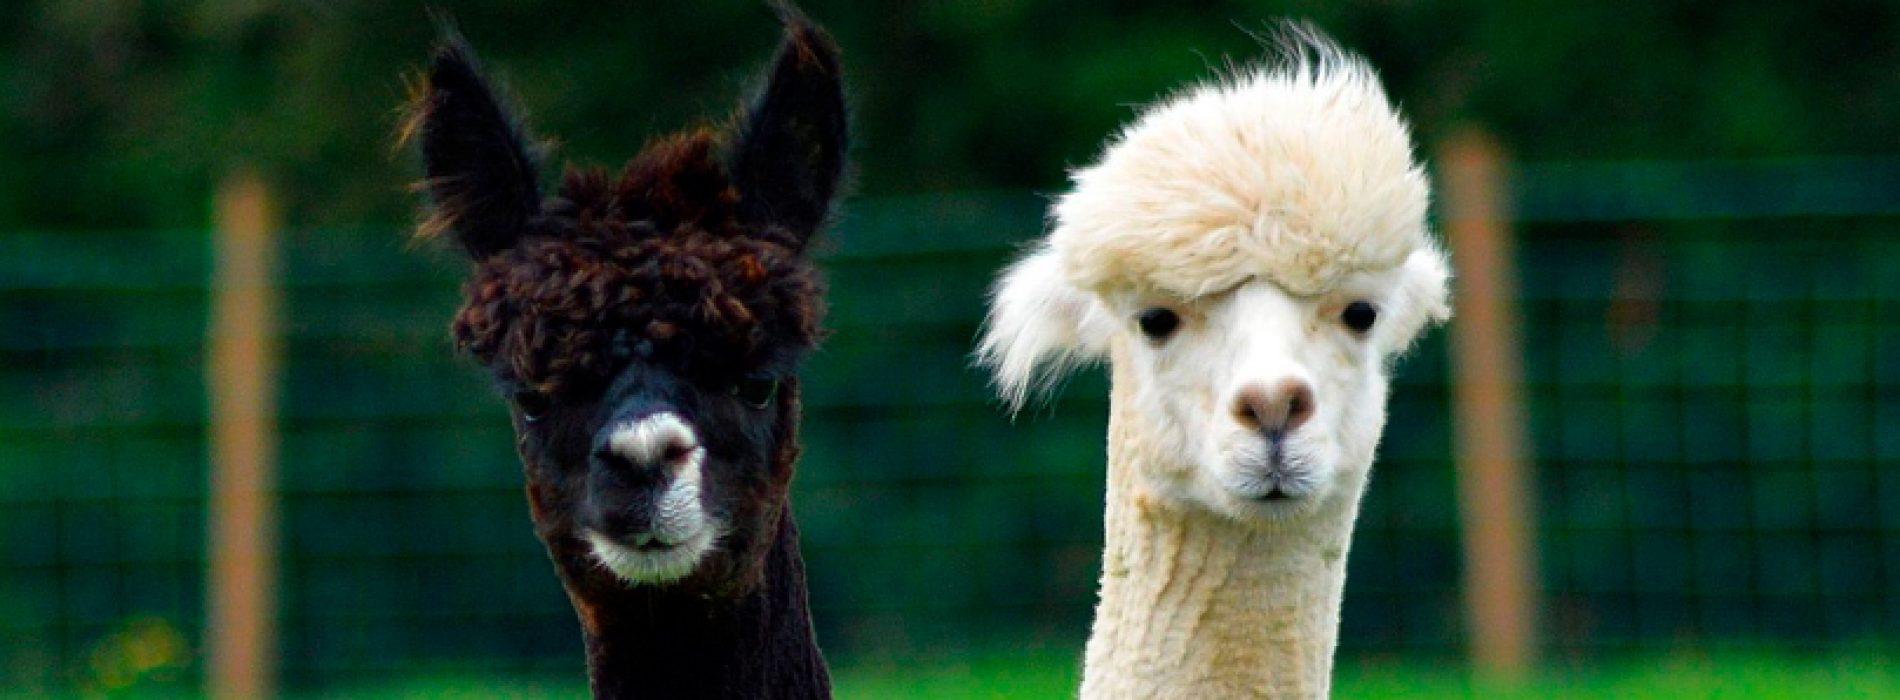 Chilean scientists study alpacas antibodies to fight COVID-19